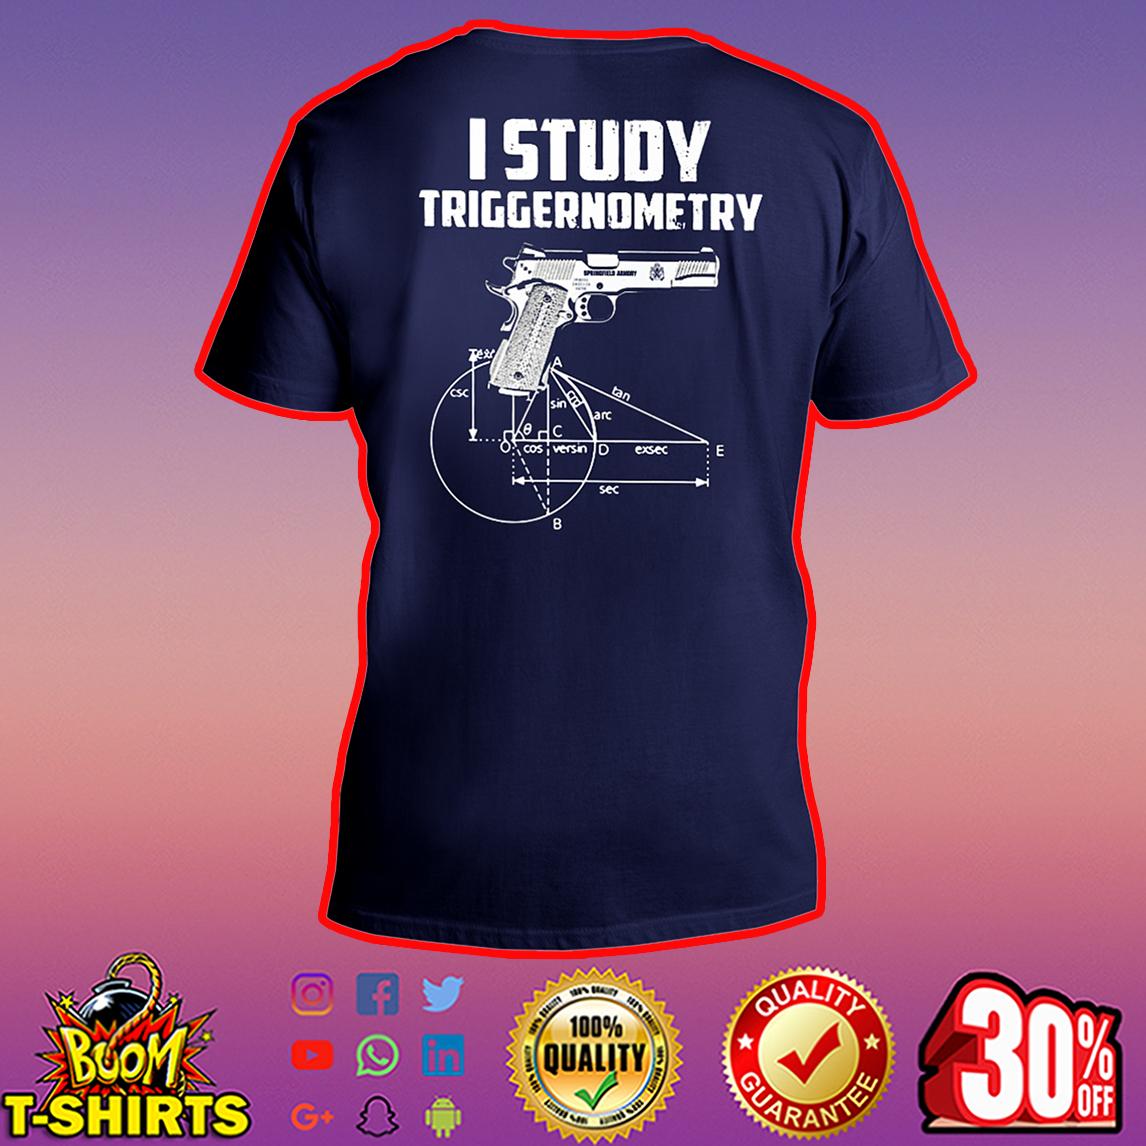 I Study Triggernometry v-neck